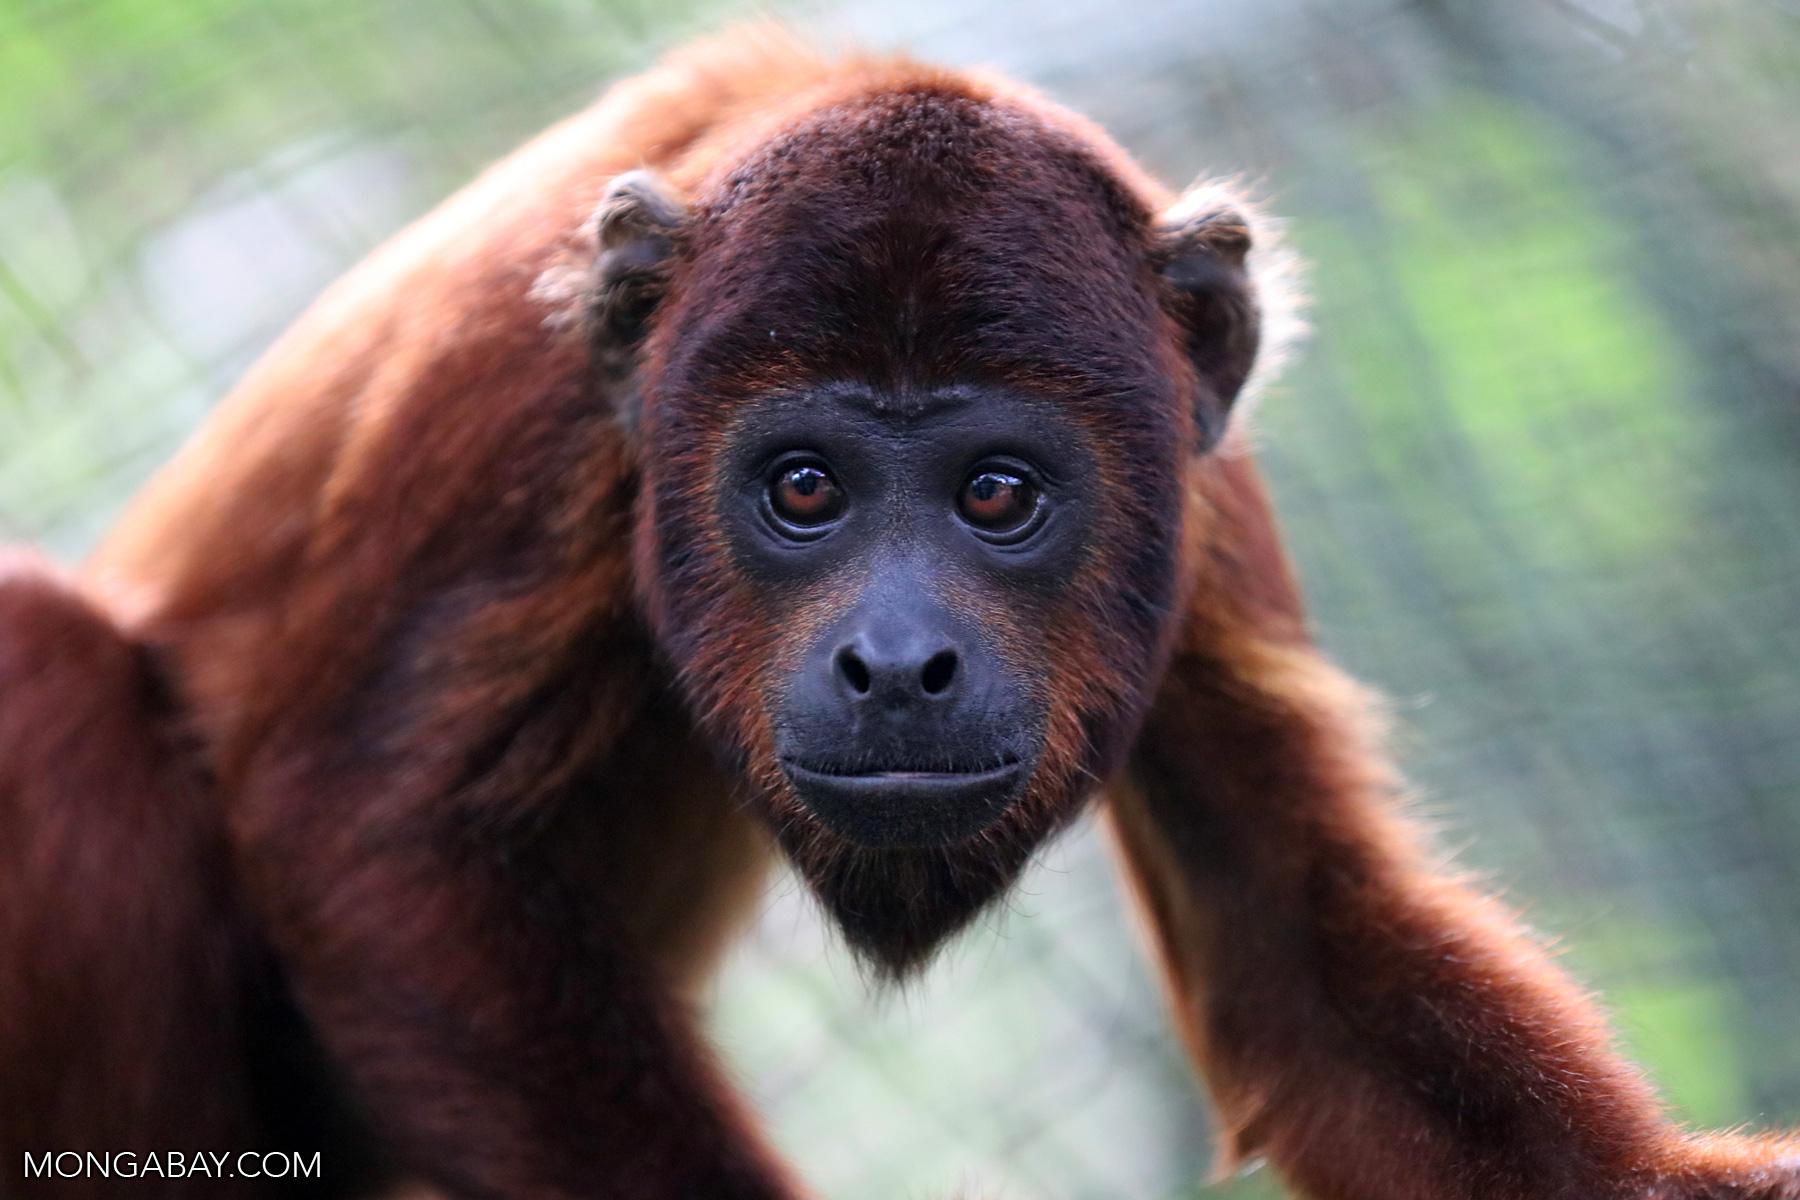 Red howler monkey in the Amazon. Photo by Rhett A. Butler for Mongabay.